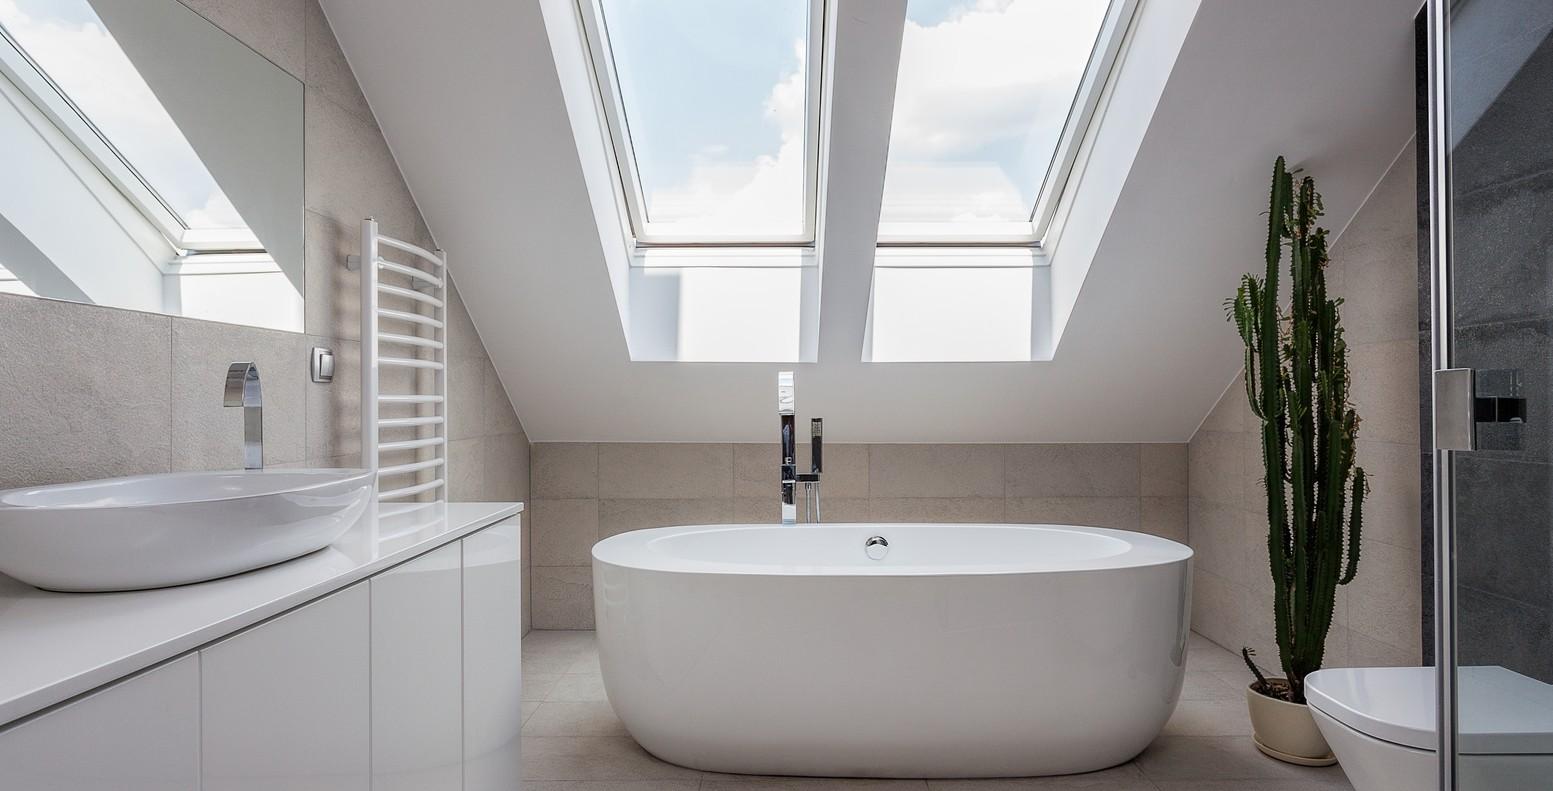 baño moderno Archivos - Complementos para cocinas modernas 76dfff5025c9